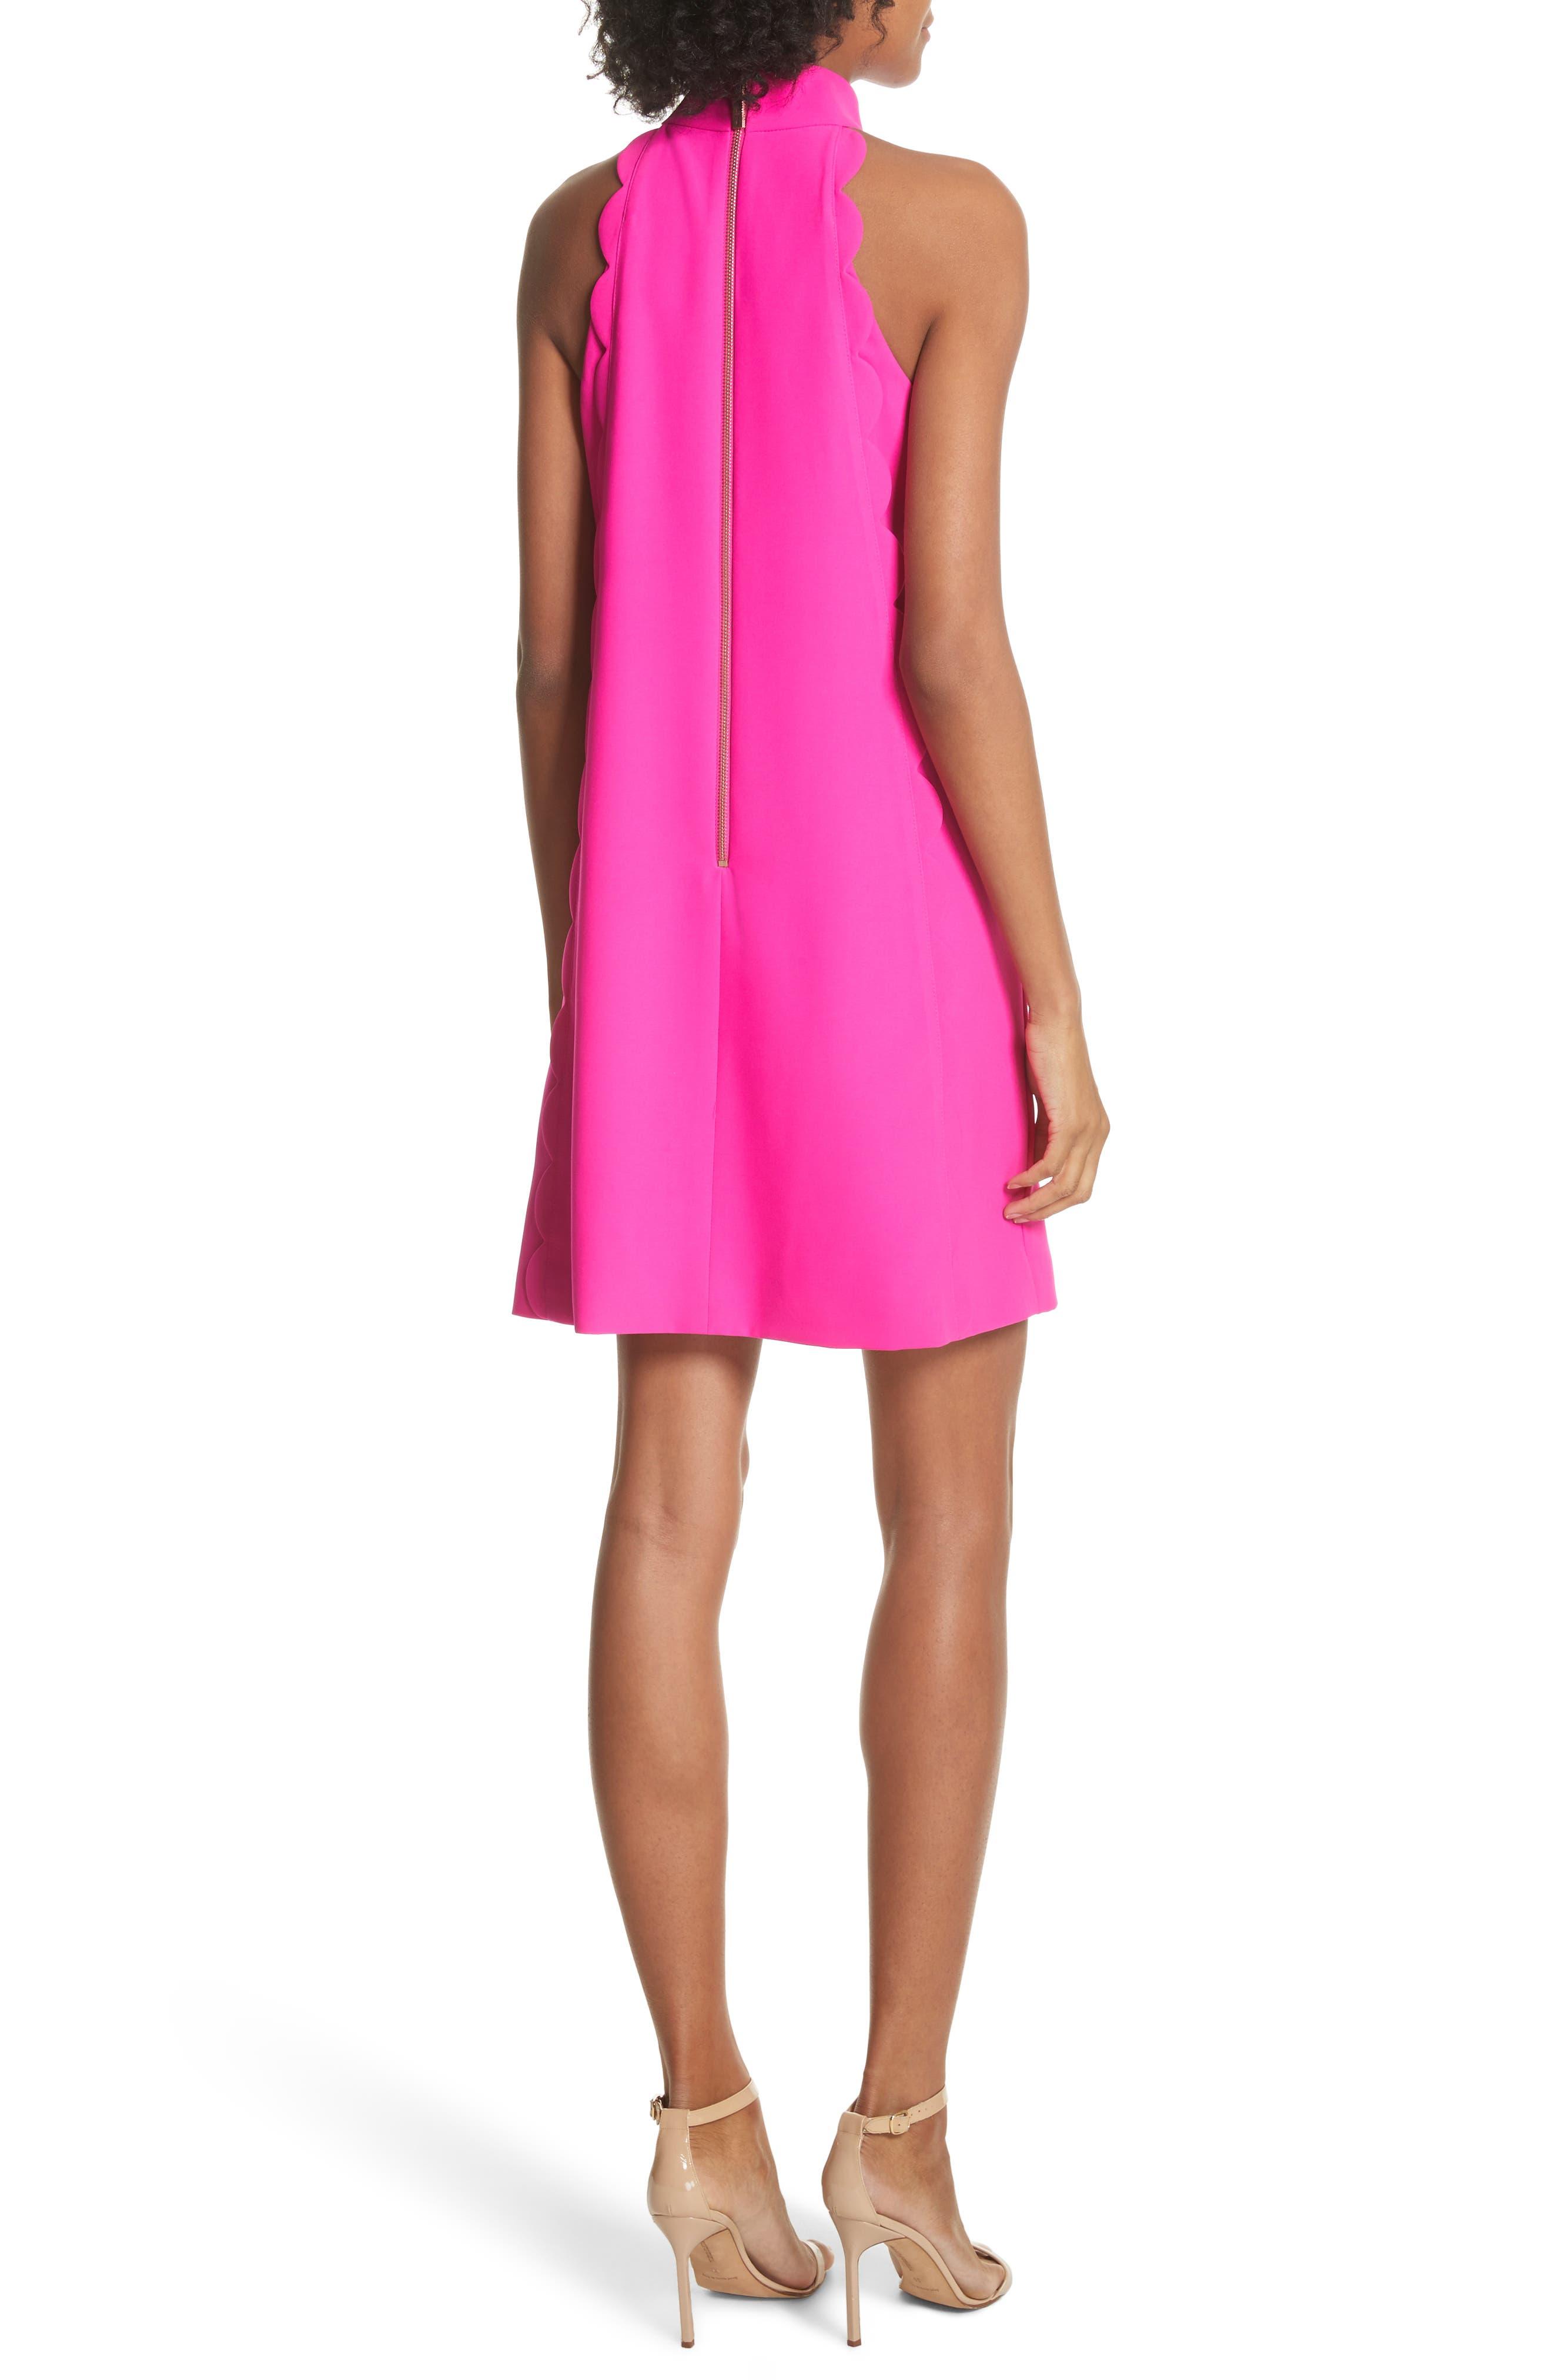 Torrii High Neck Tunic Dress,                             Alternate thumbnail 2, color,                             Bright Pink